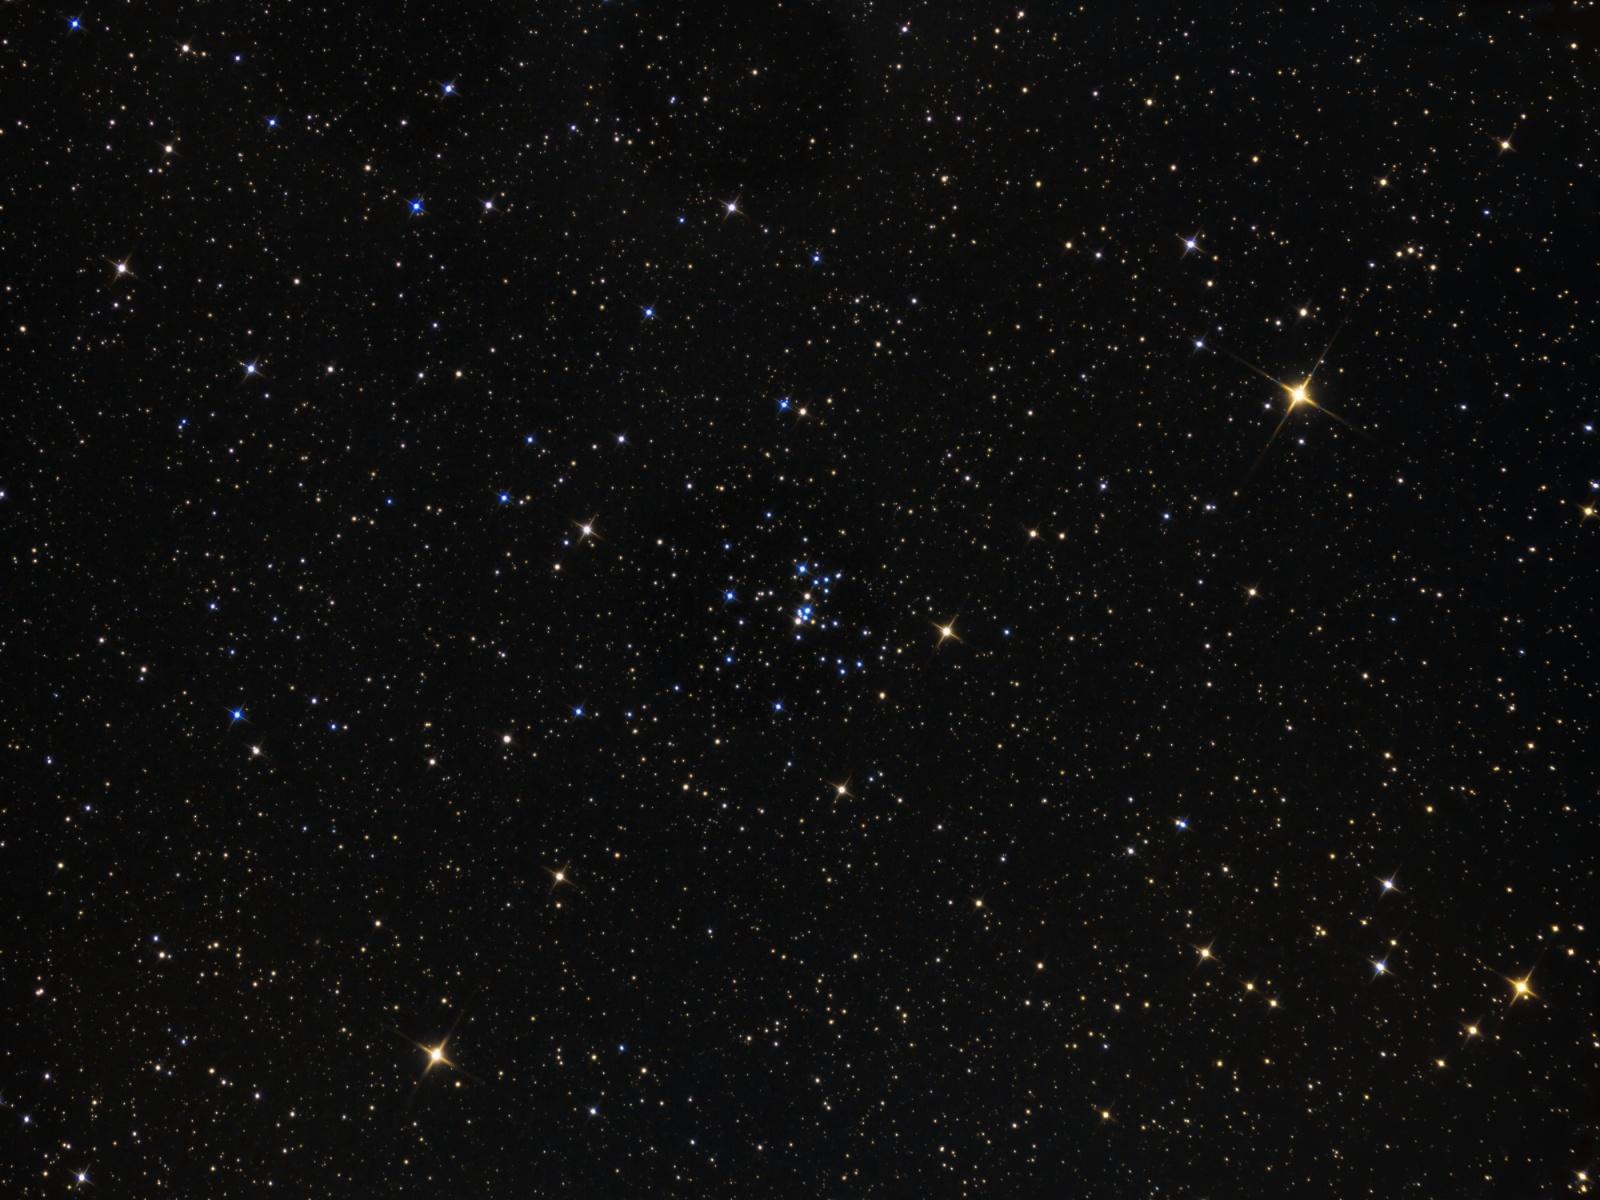 NGC2281_crop_4800_3600_DBE_resize_2000_1500.thumb.jpg.25ad30f2c35811f9cdb6576fc8bde75b.jpg